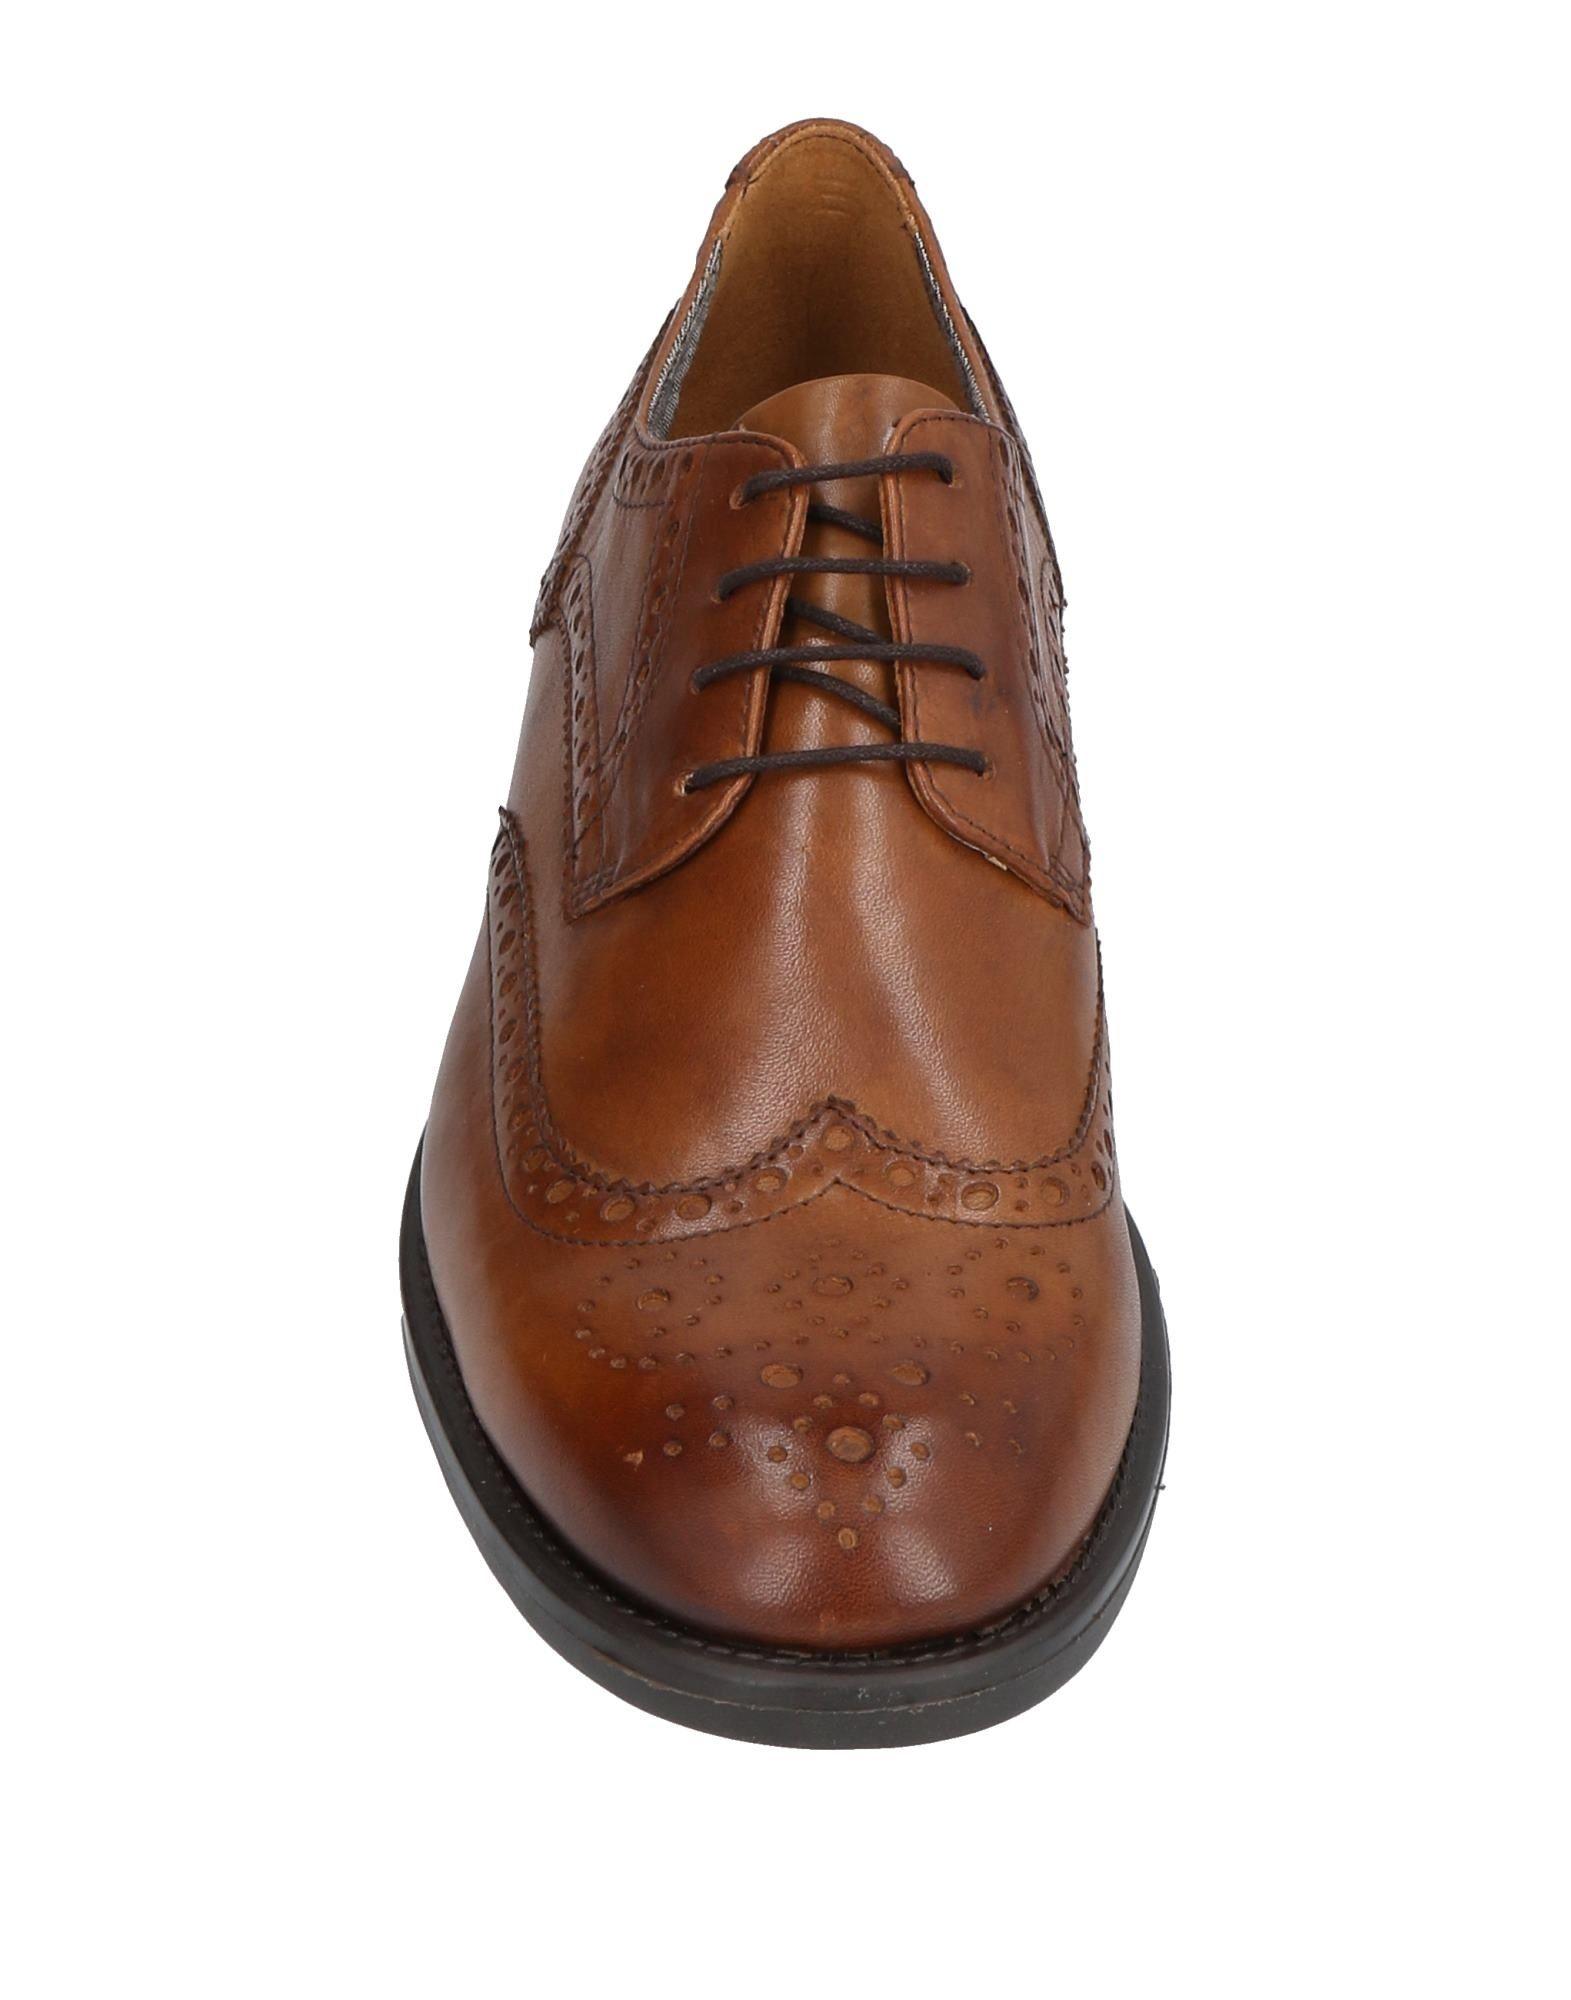 Vagabond Shoemakers Schnürschuhe Damen  11439018CW Gute Qualität beliebte Schuhe